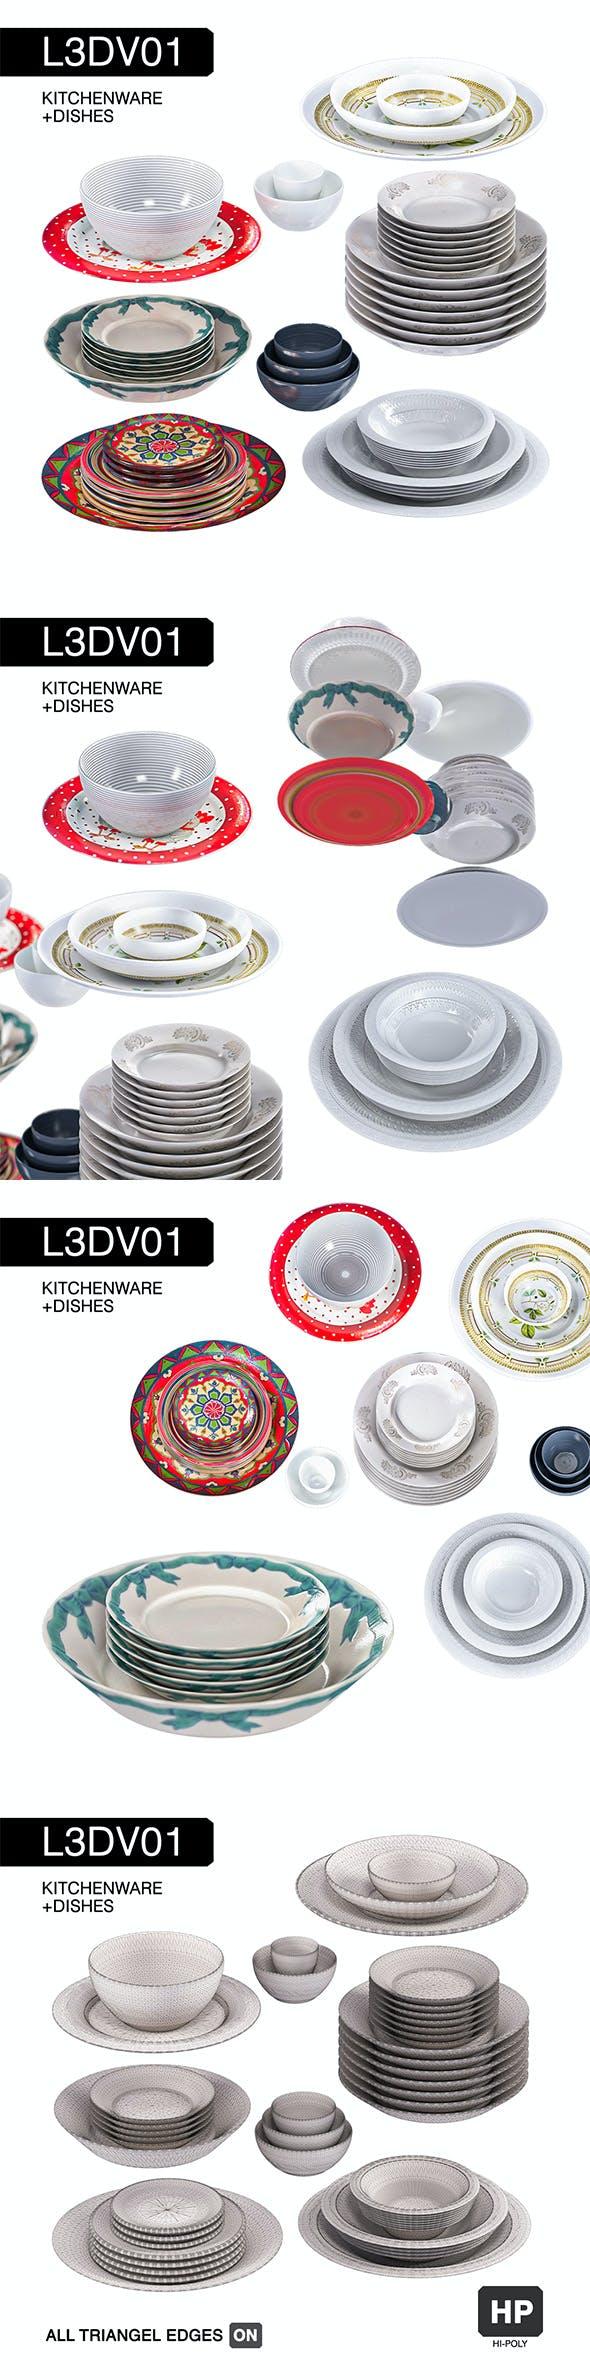 L3DV01G06 - kitchen dishes set - 3DOcean Item for Sale